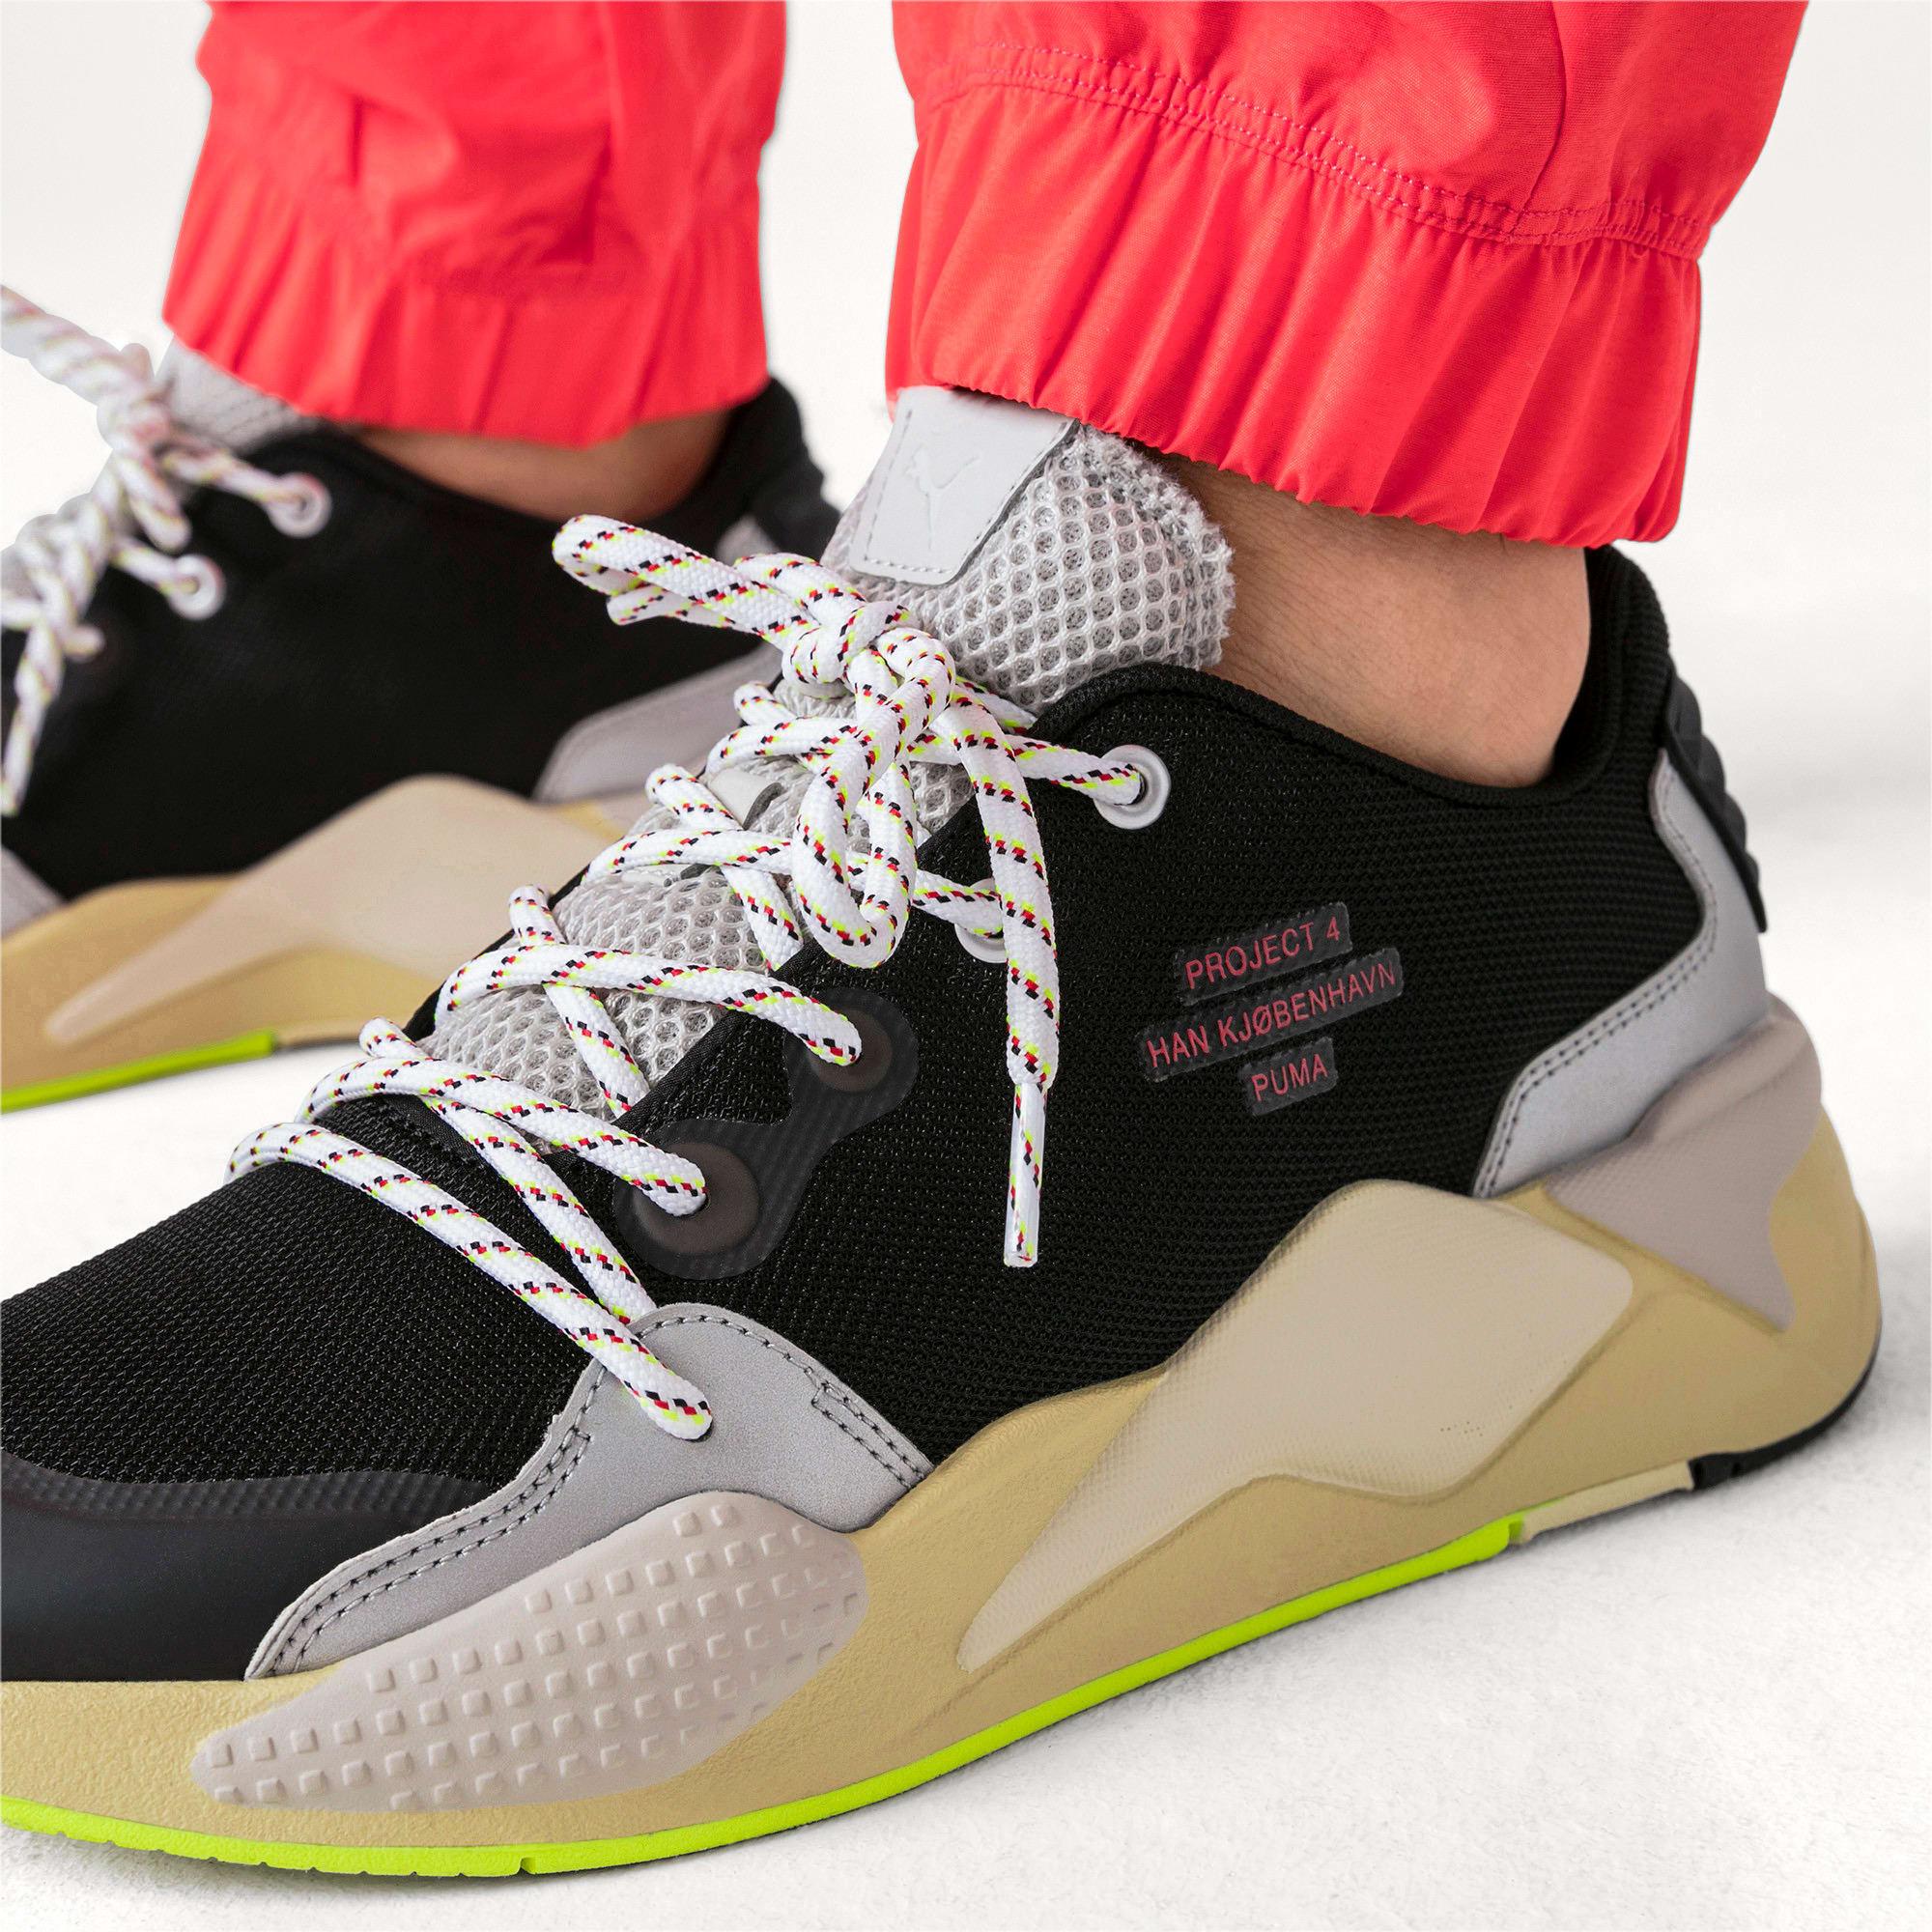 Thumbnail 3 of PUMA x HAN KJØBENHAVN RS-X Sneakers, Puma Black-Puma Silver, medium